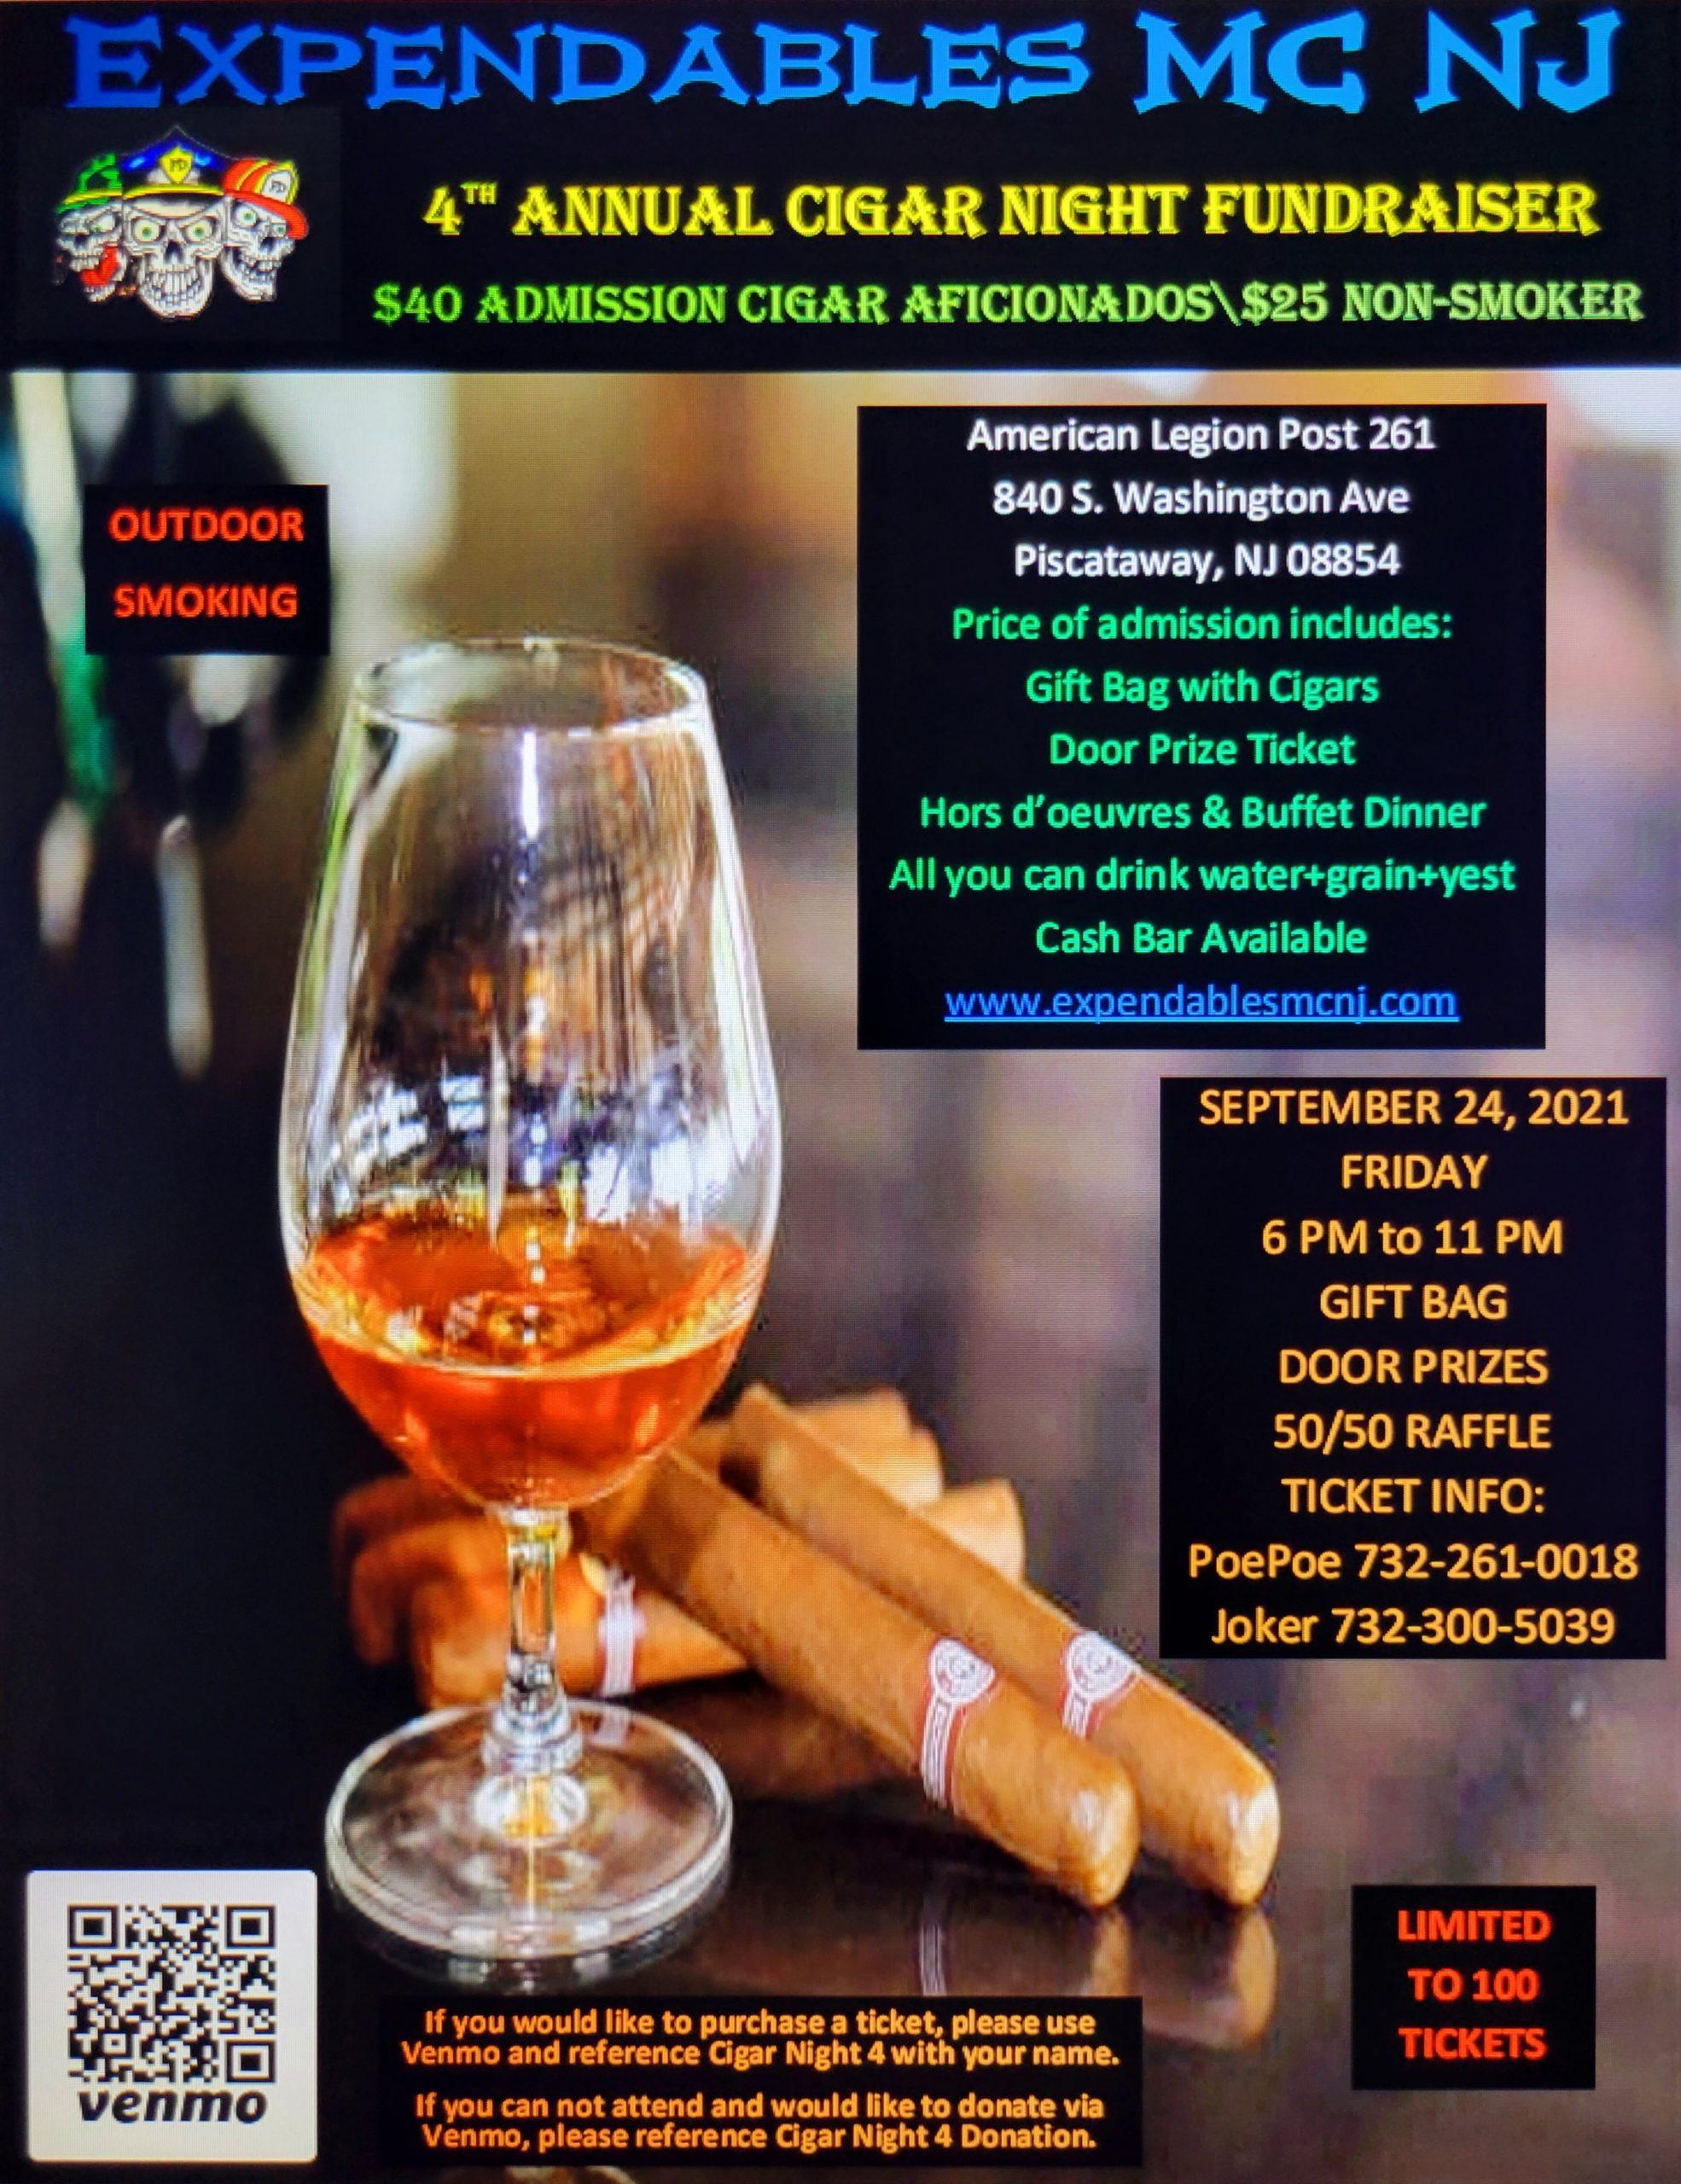 ExpMCNJCigar21 scaled - Expendables MC NJ Cigar Fundraiser